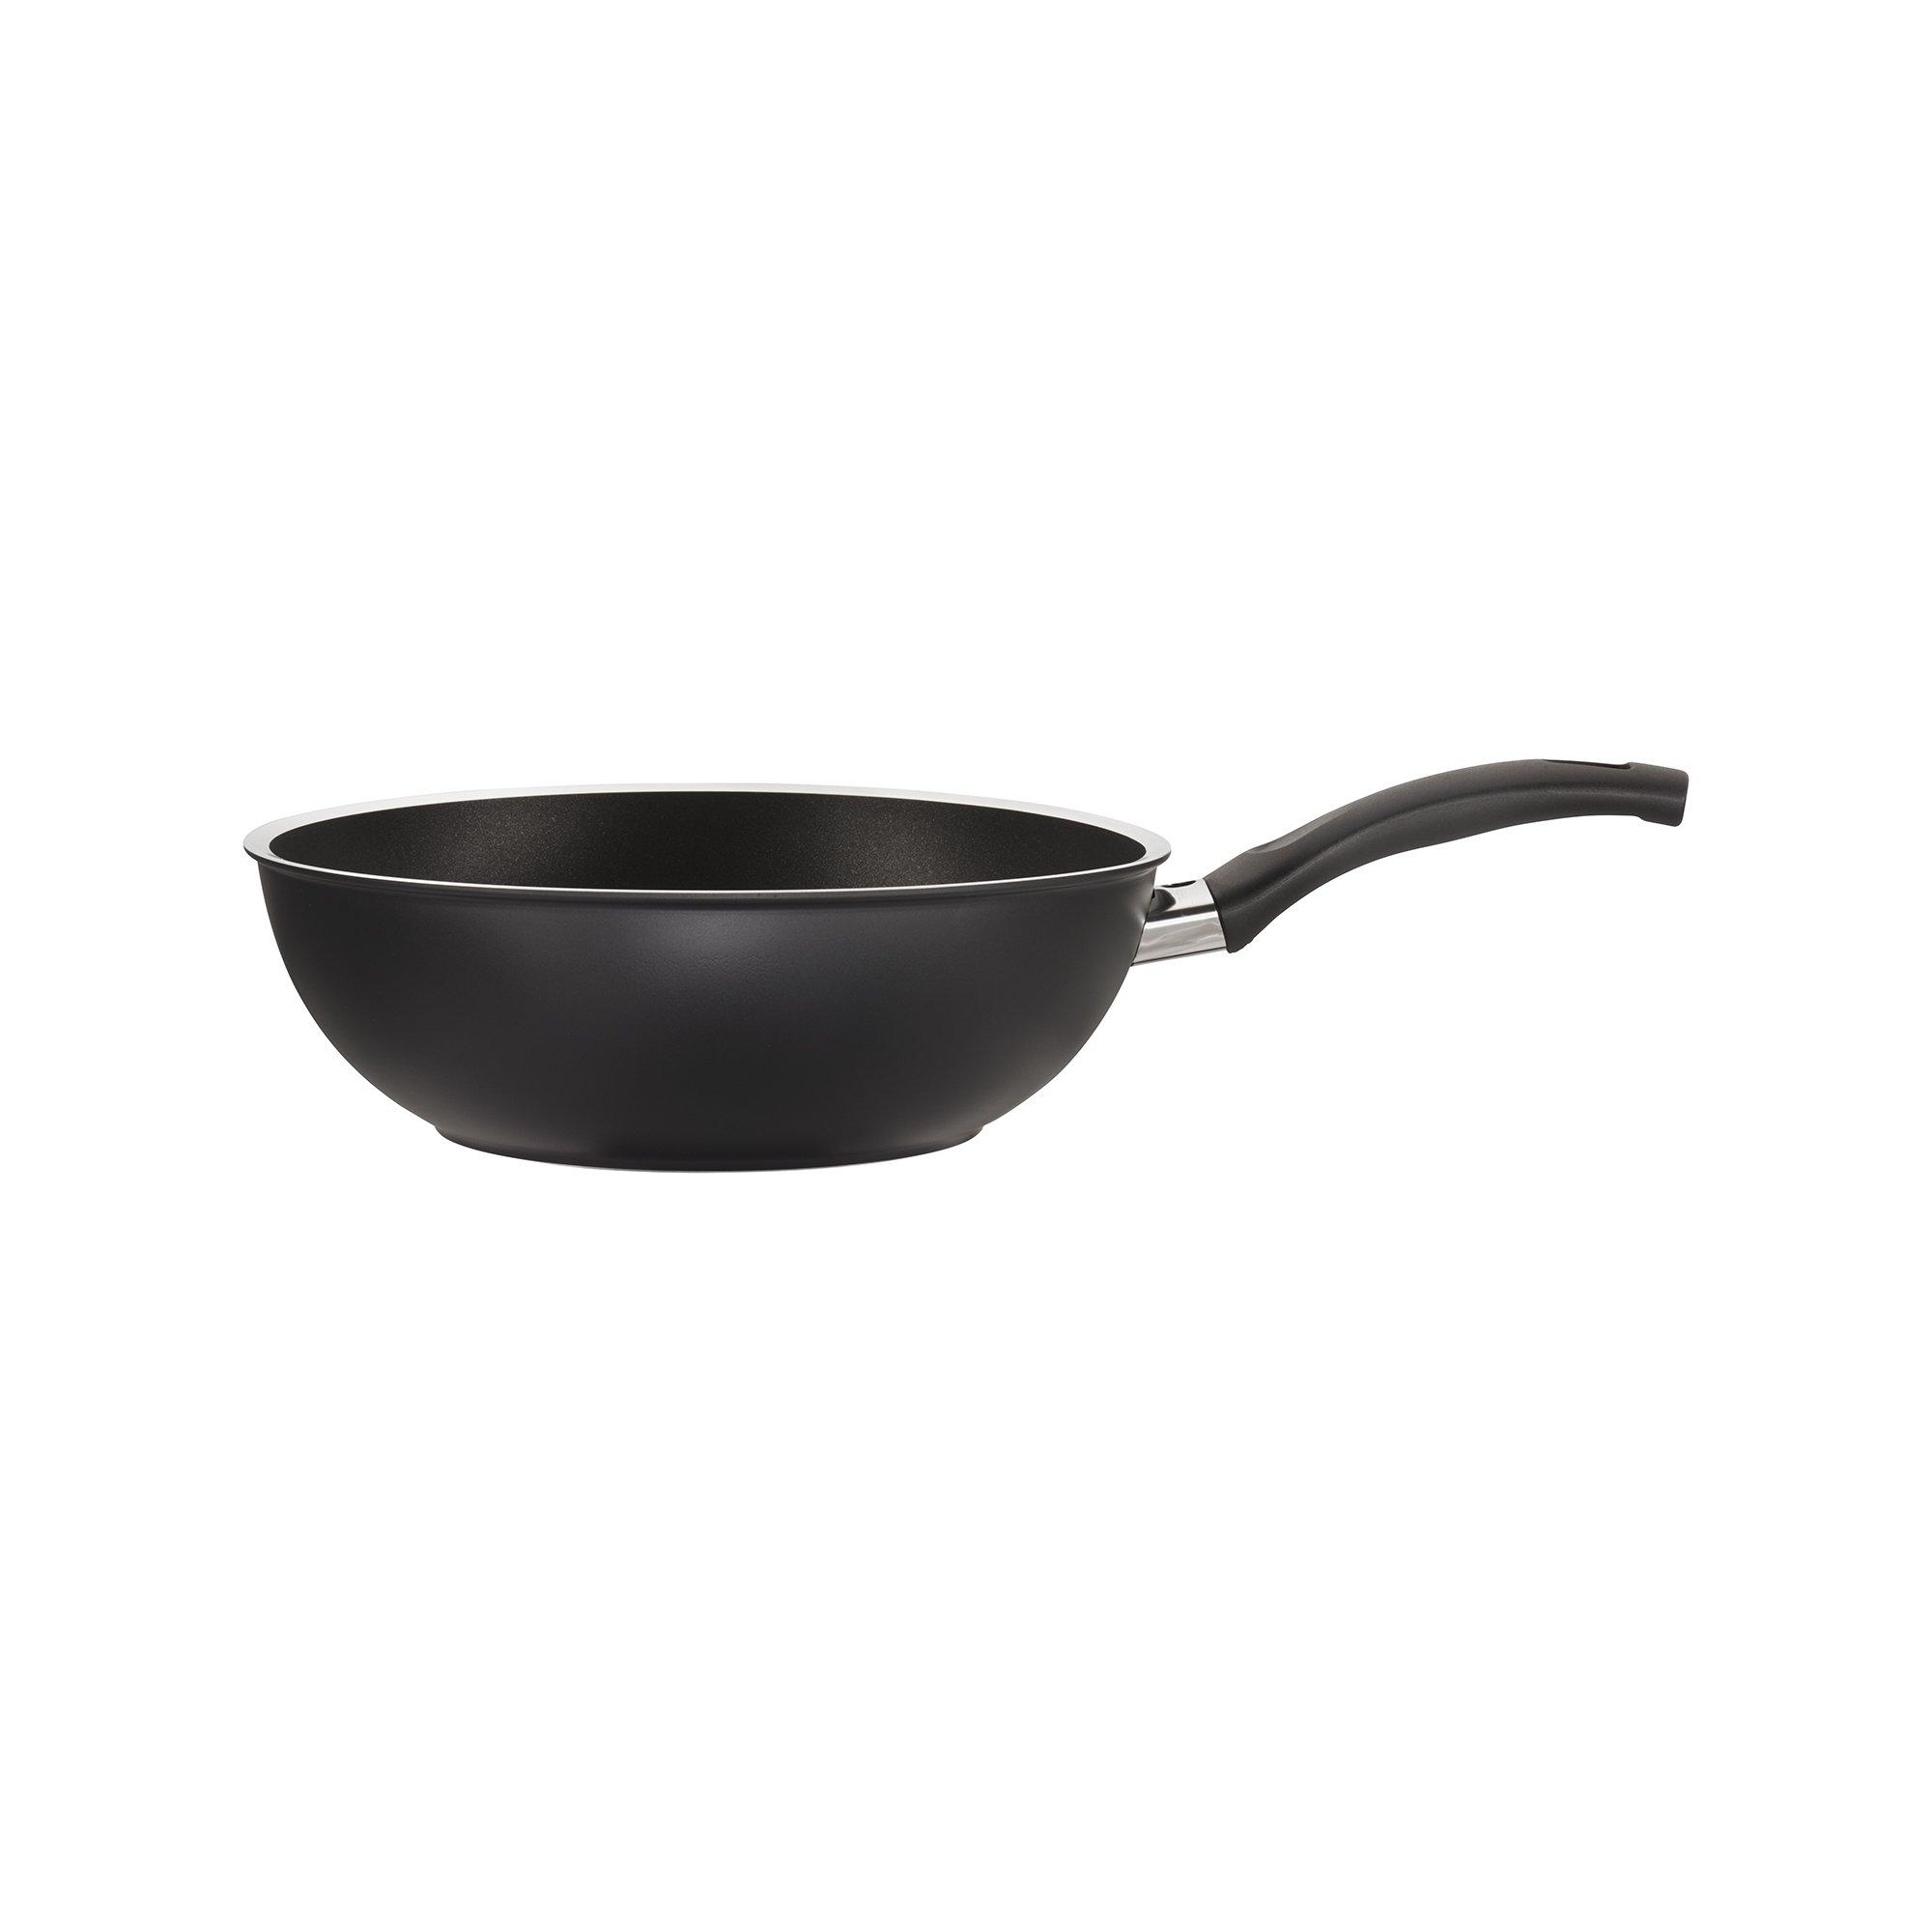 Ballarini 75001-631 Como Forged Aluminum Nonstick Stir Fry Pan, 11'', Black